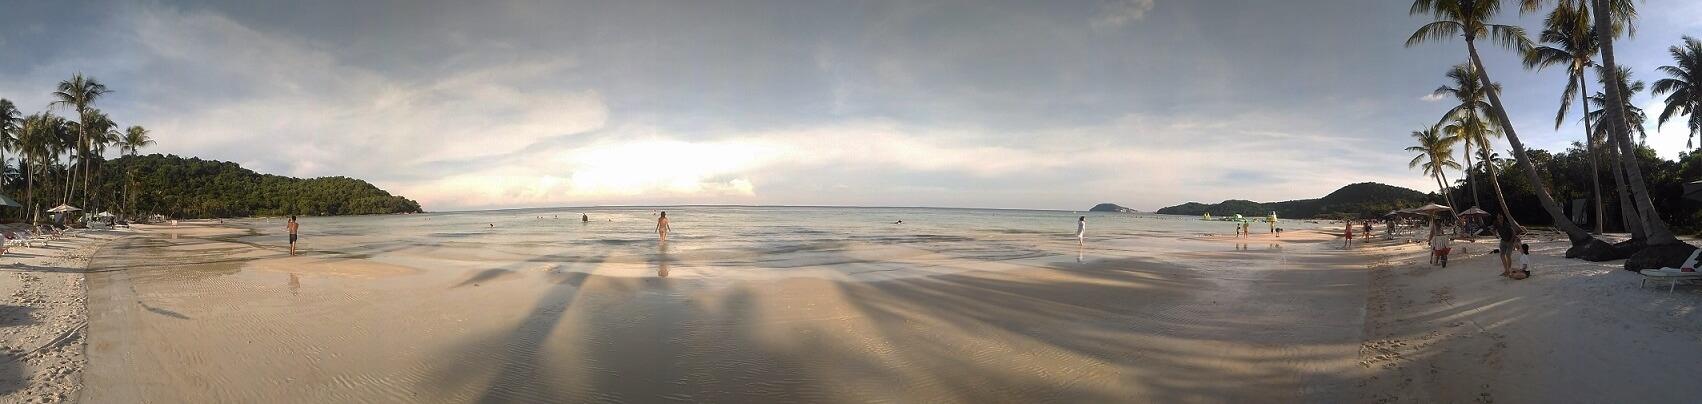 ICT_PhuQuoc_Beach